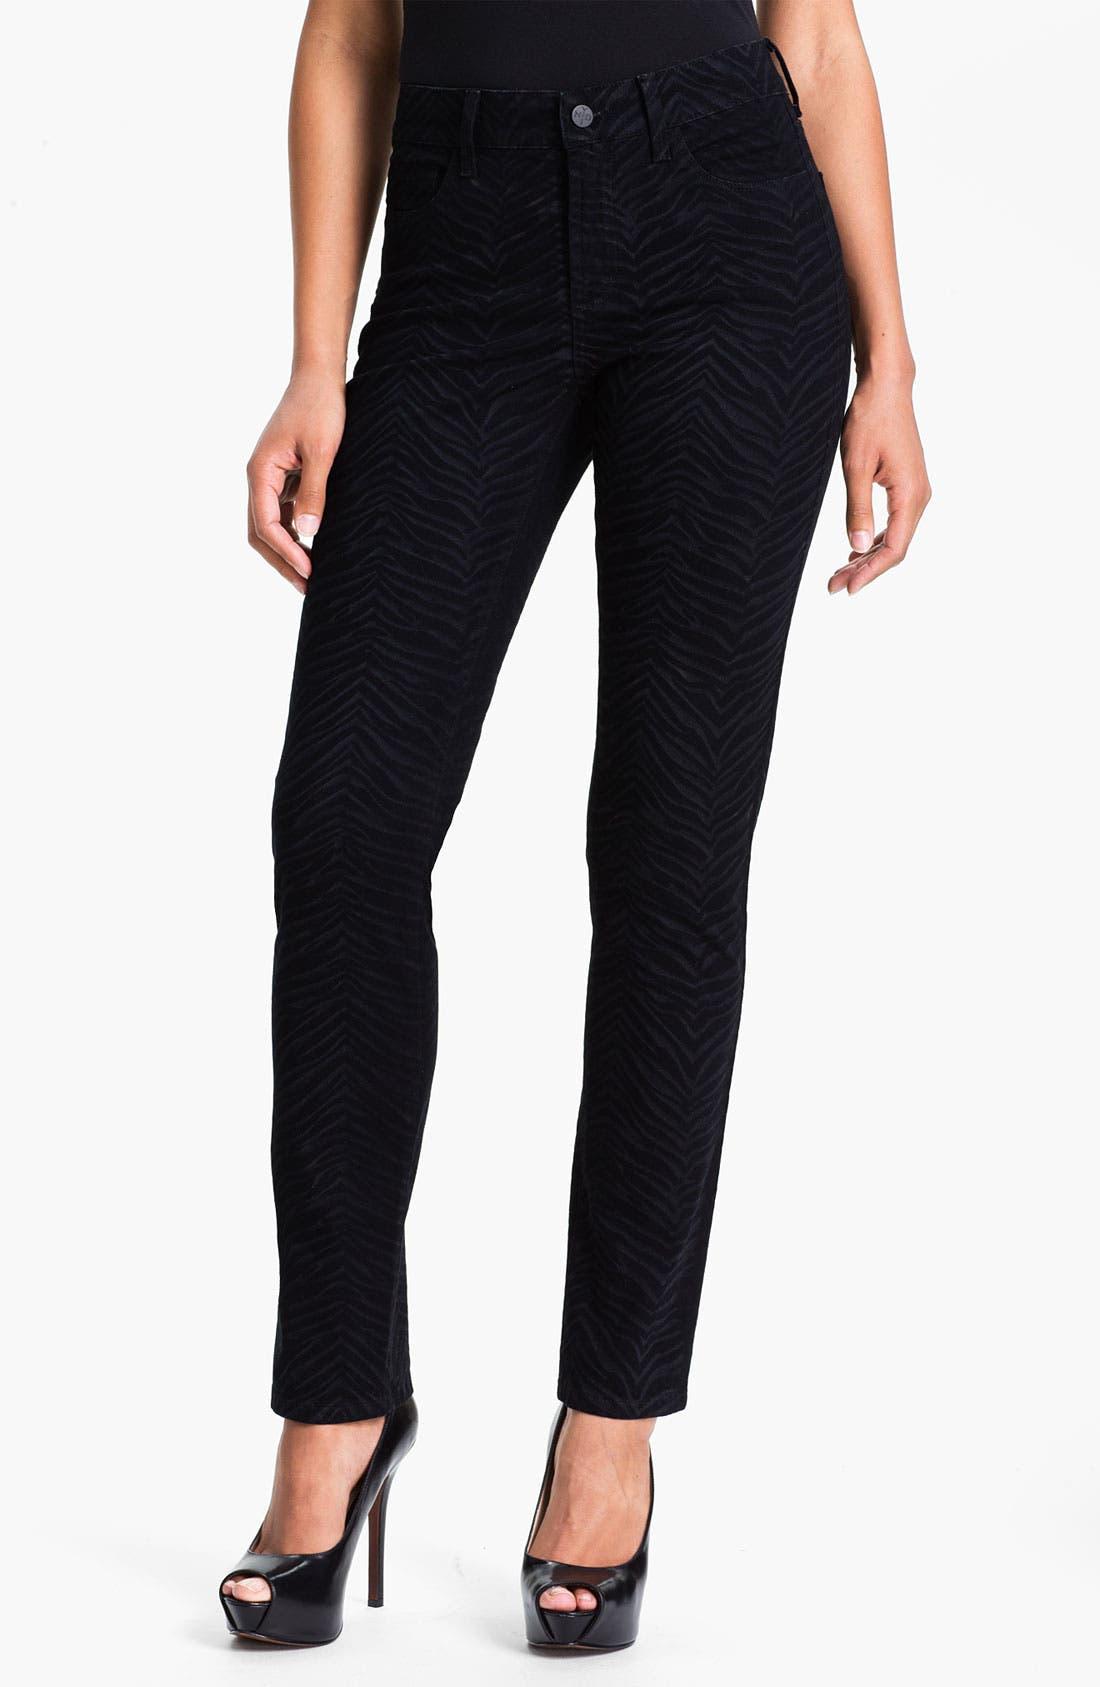 Alternate Image 1 Selected - NYDJ 'Sheri - Zebra' Print Twill Skinny Jeans (Petite)